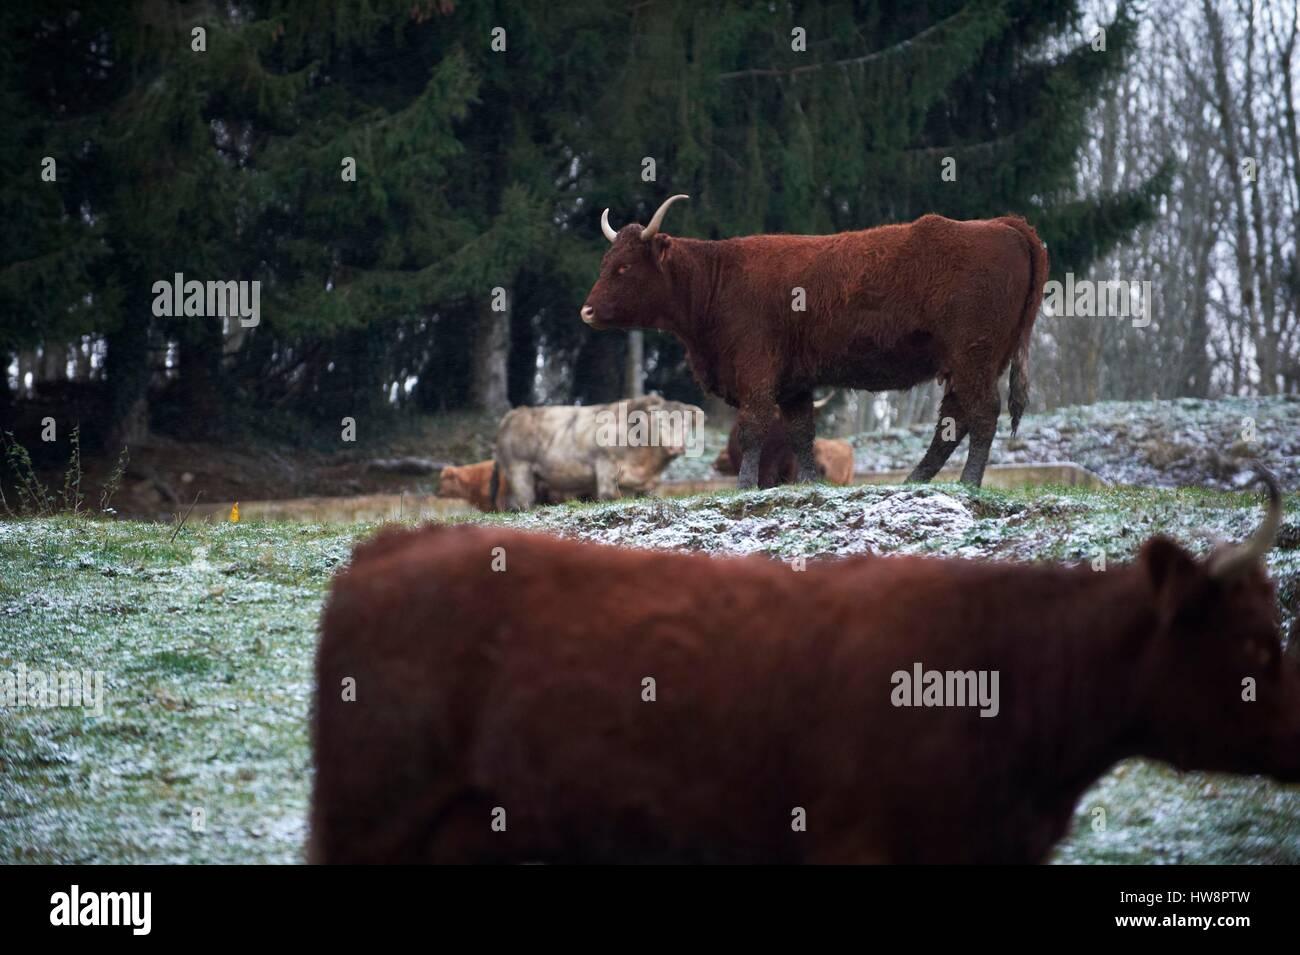 France, Correze, cows, Salers breeds - Stock Image